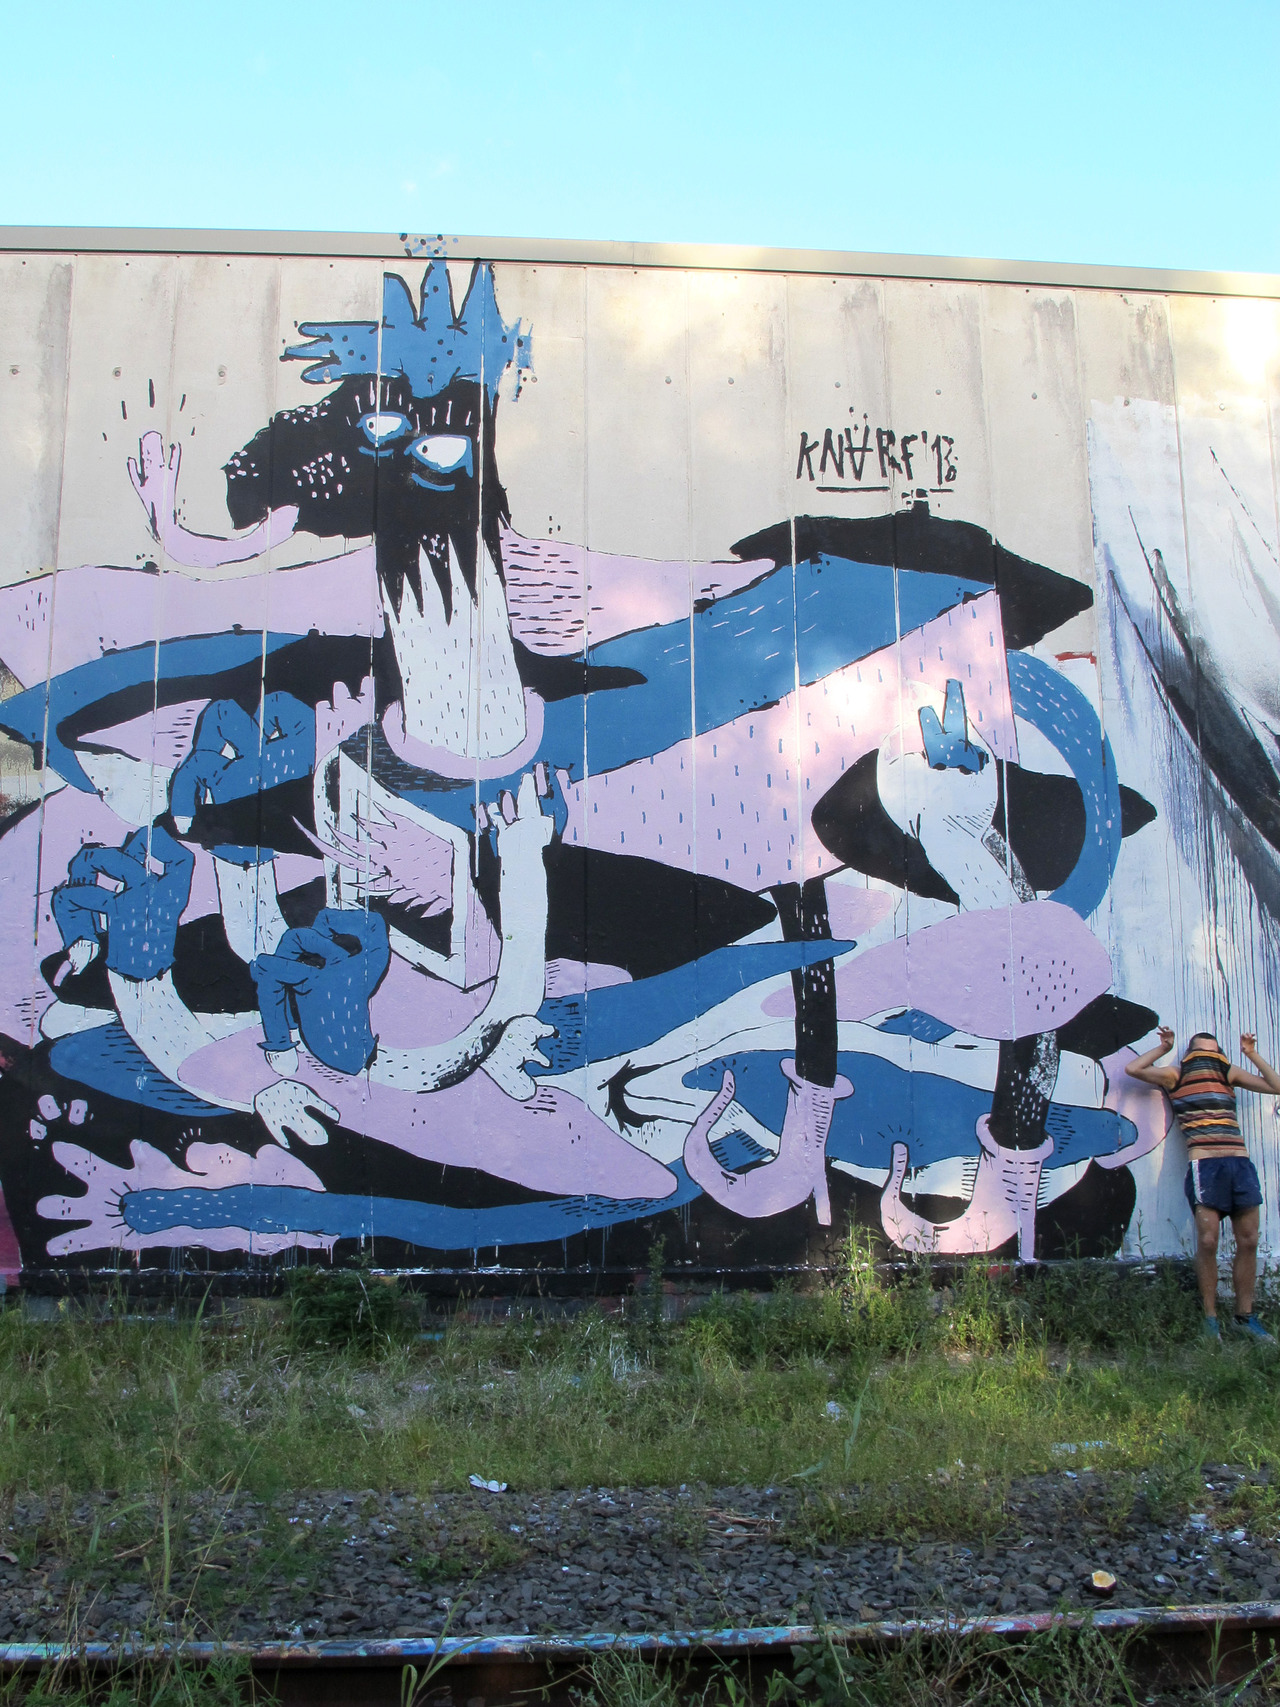 shida-x-knarf-new-murals-in-australia-part-ii-03